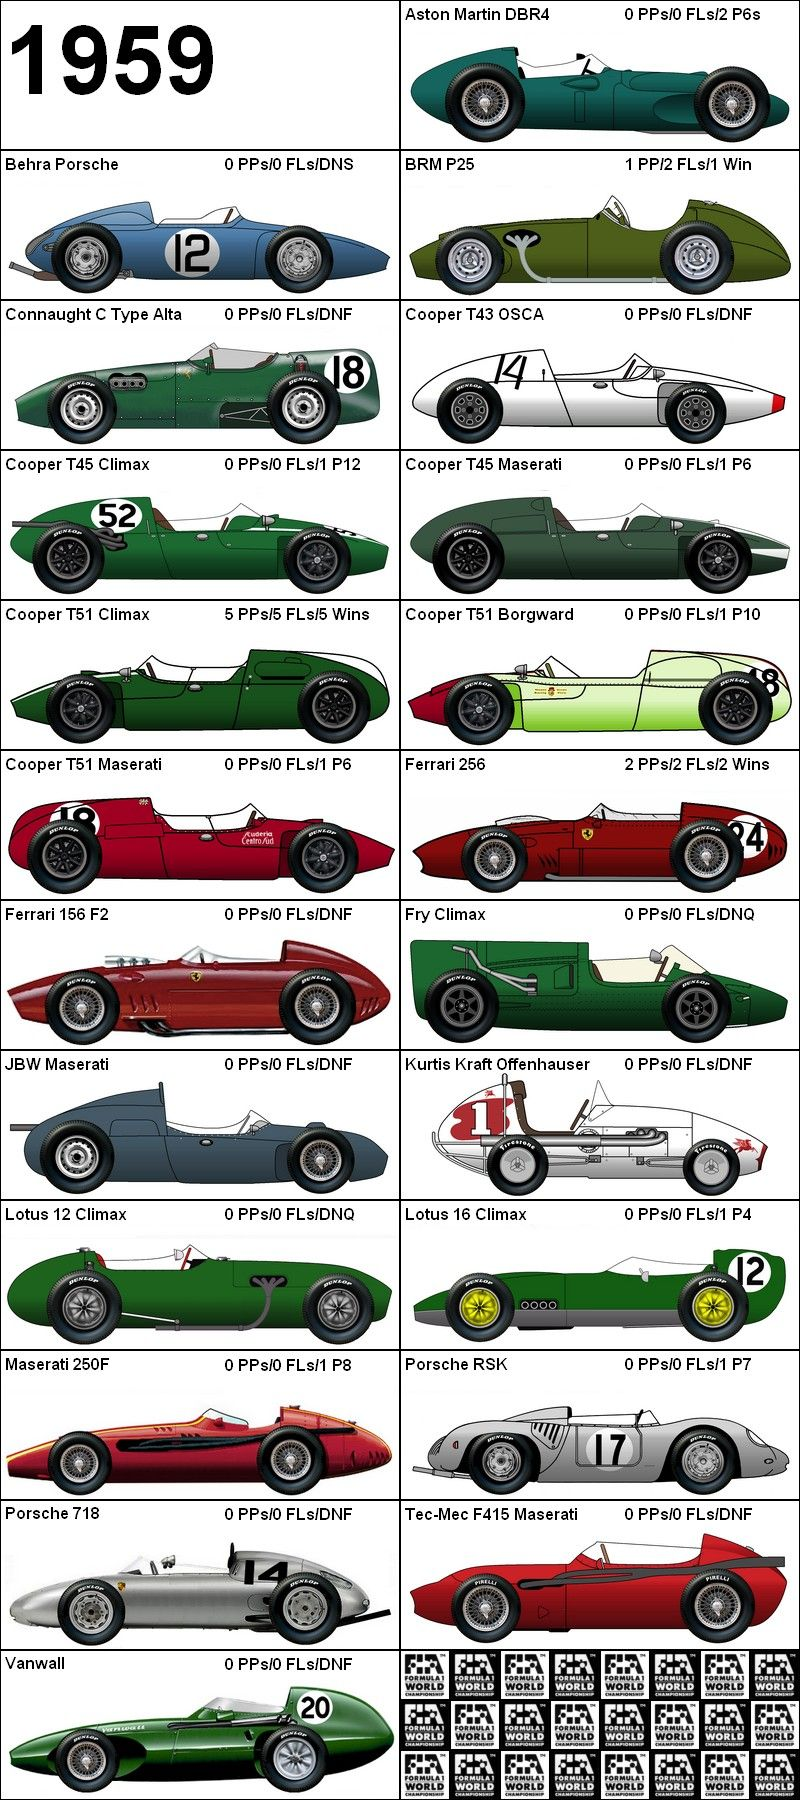 Formula One Grand Prix 1959 Cars